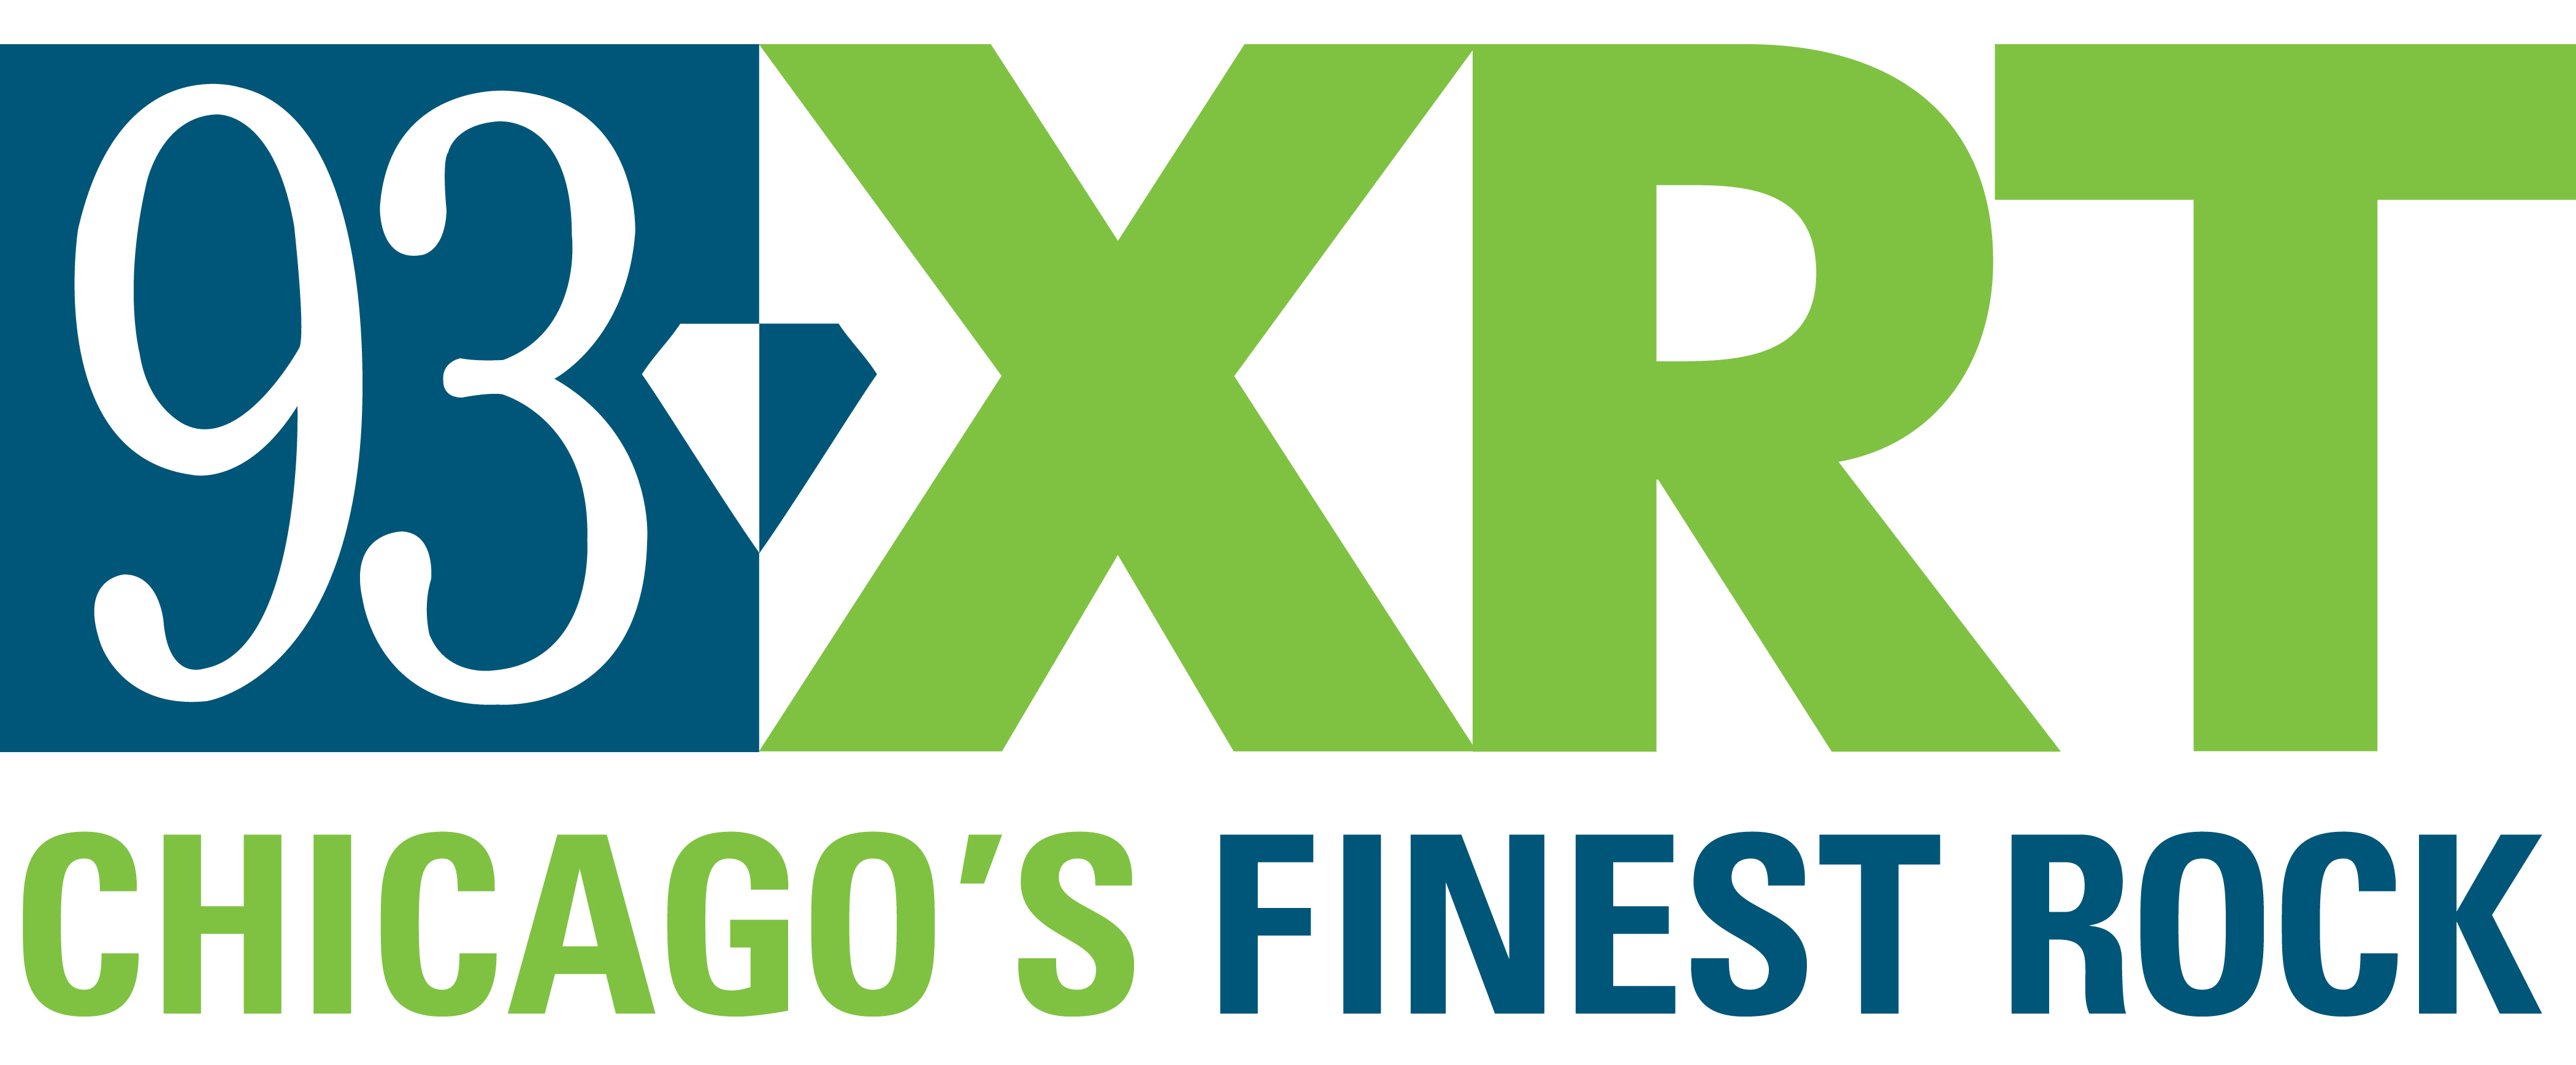 Logo for 93XRT